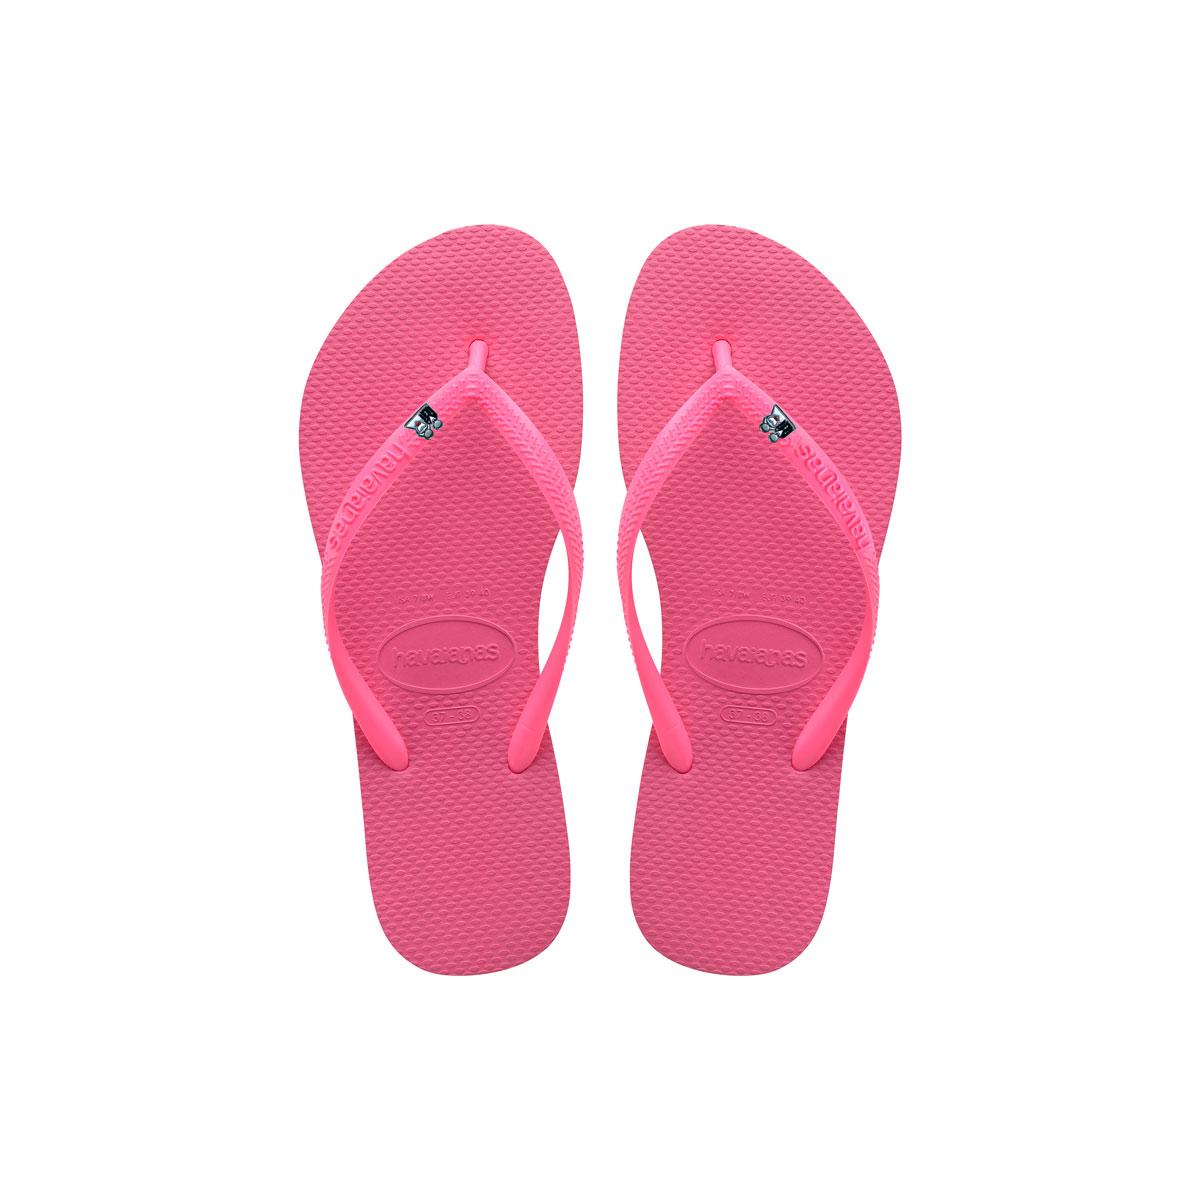 Havaianas Shocking Pink Flip Flops with Silver Bride & Groom Wedding